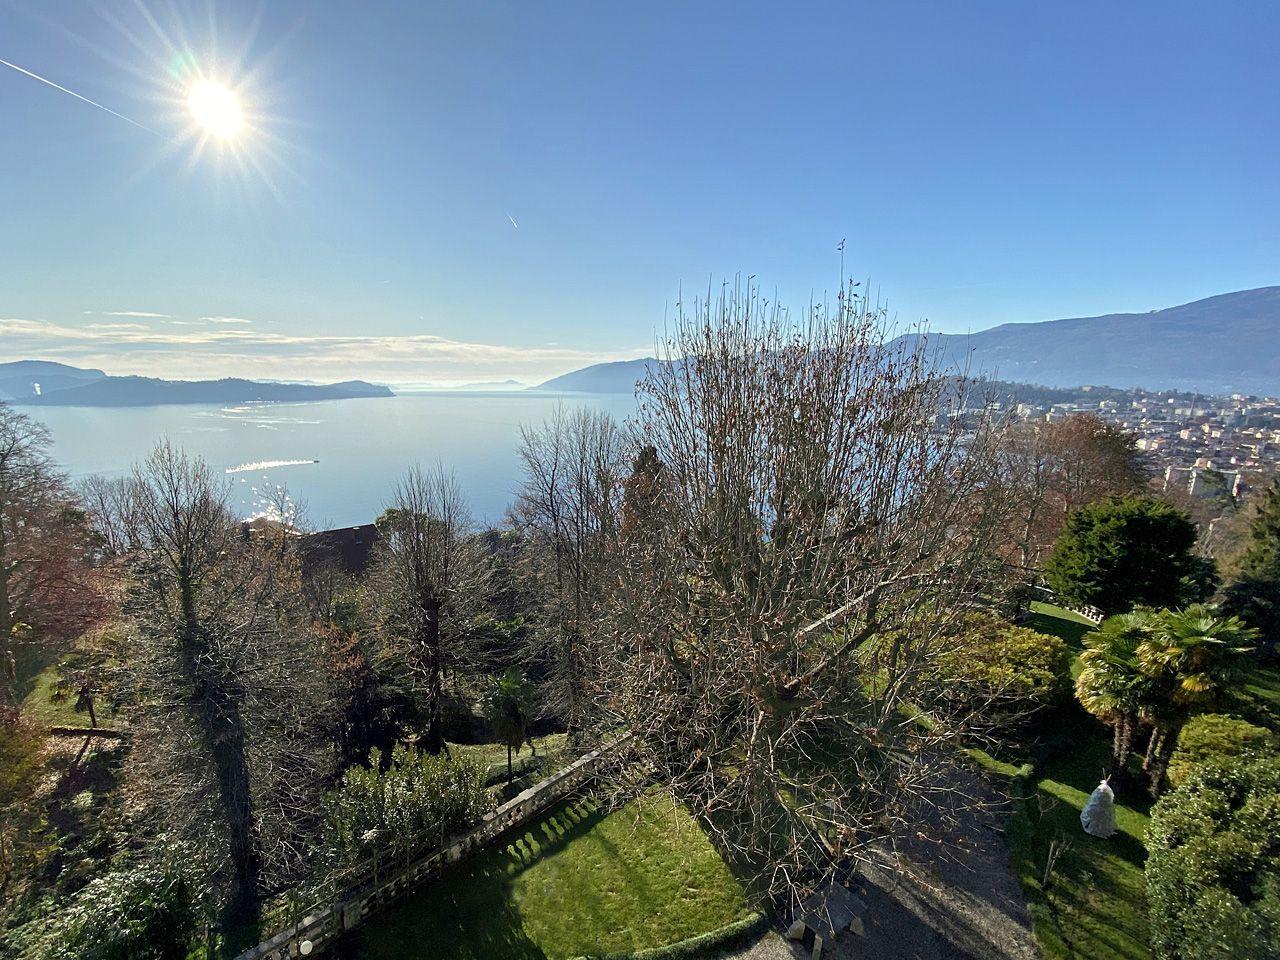 Villa d'epoca con ampio parco e panoramica vista lago